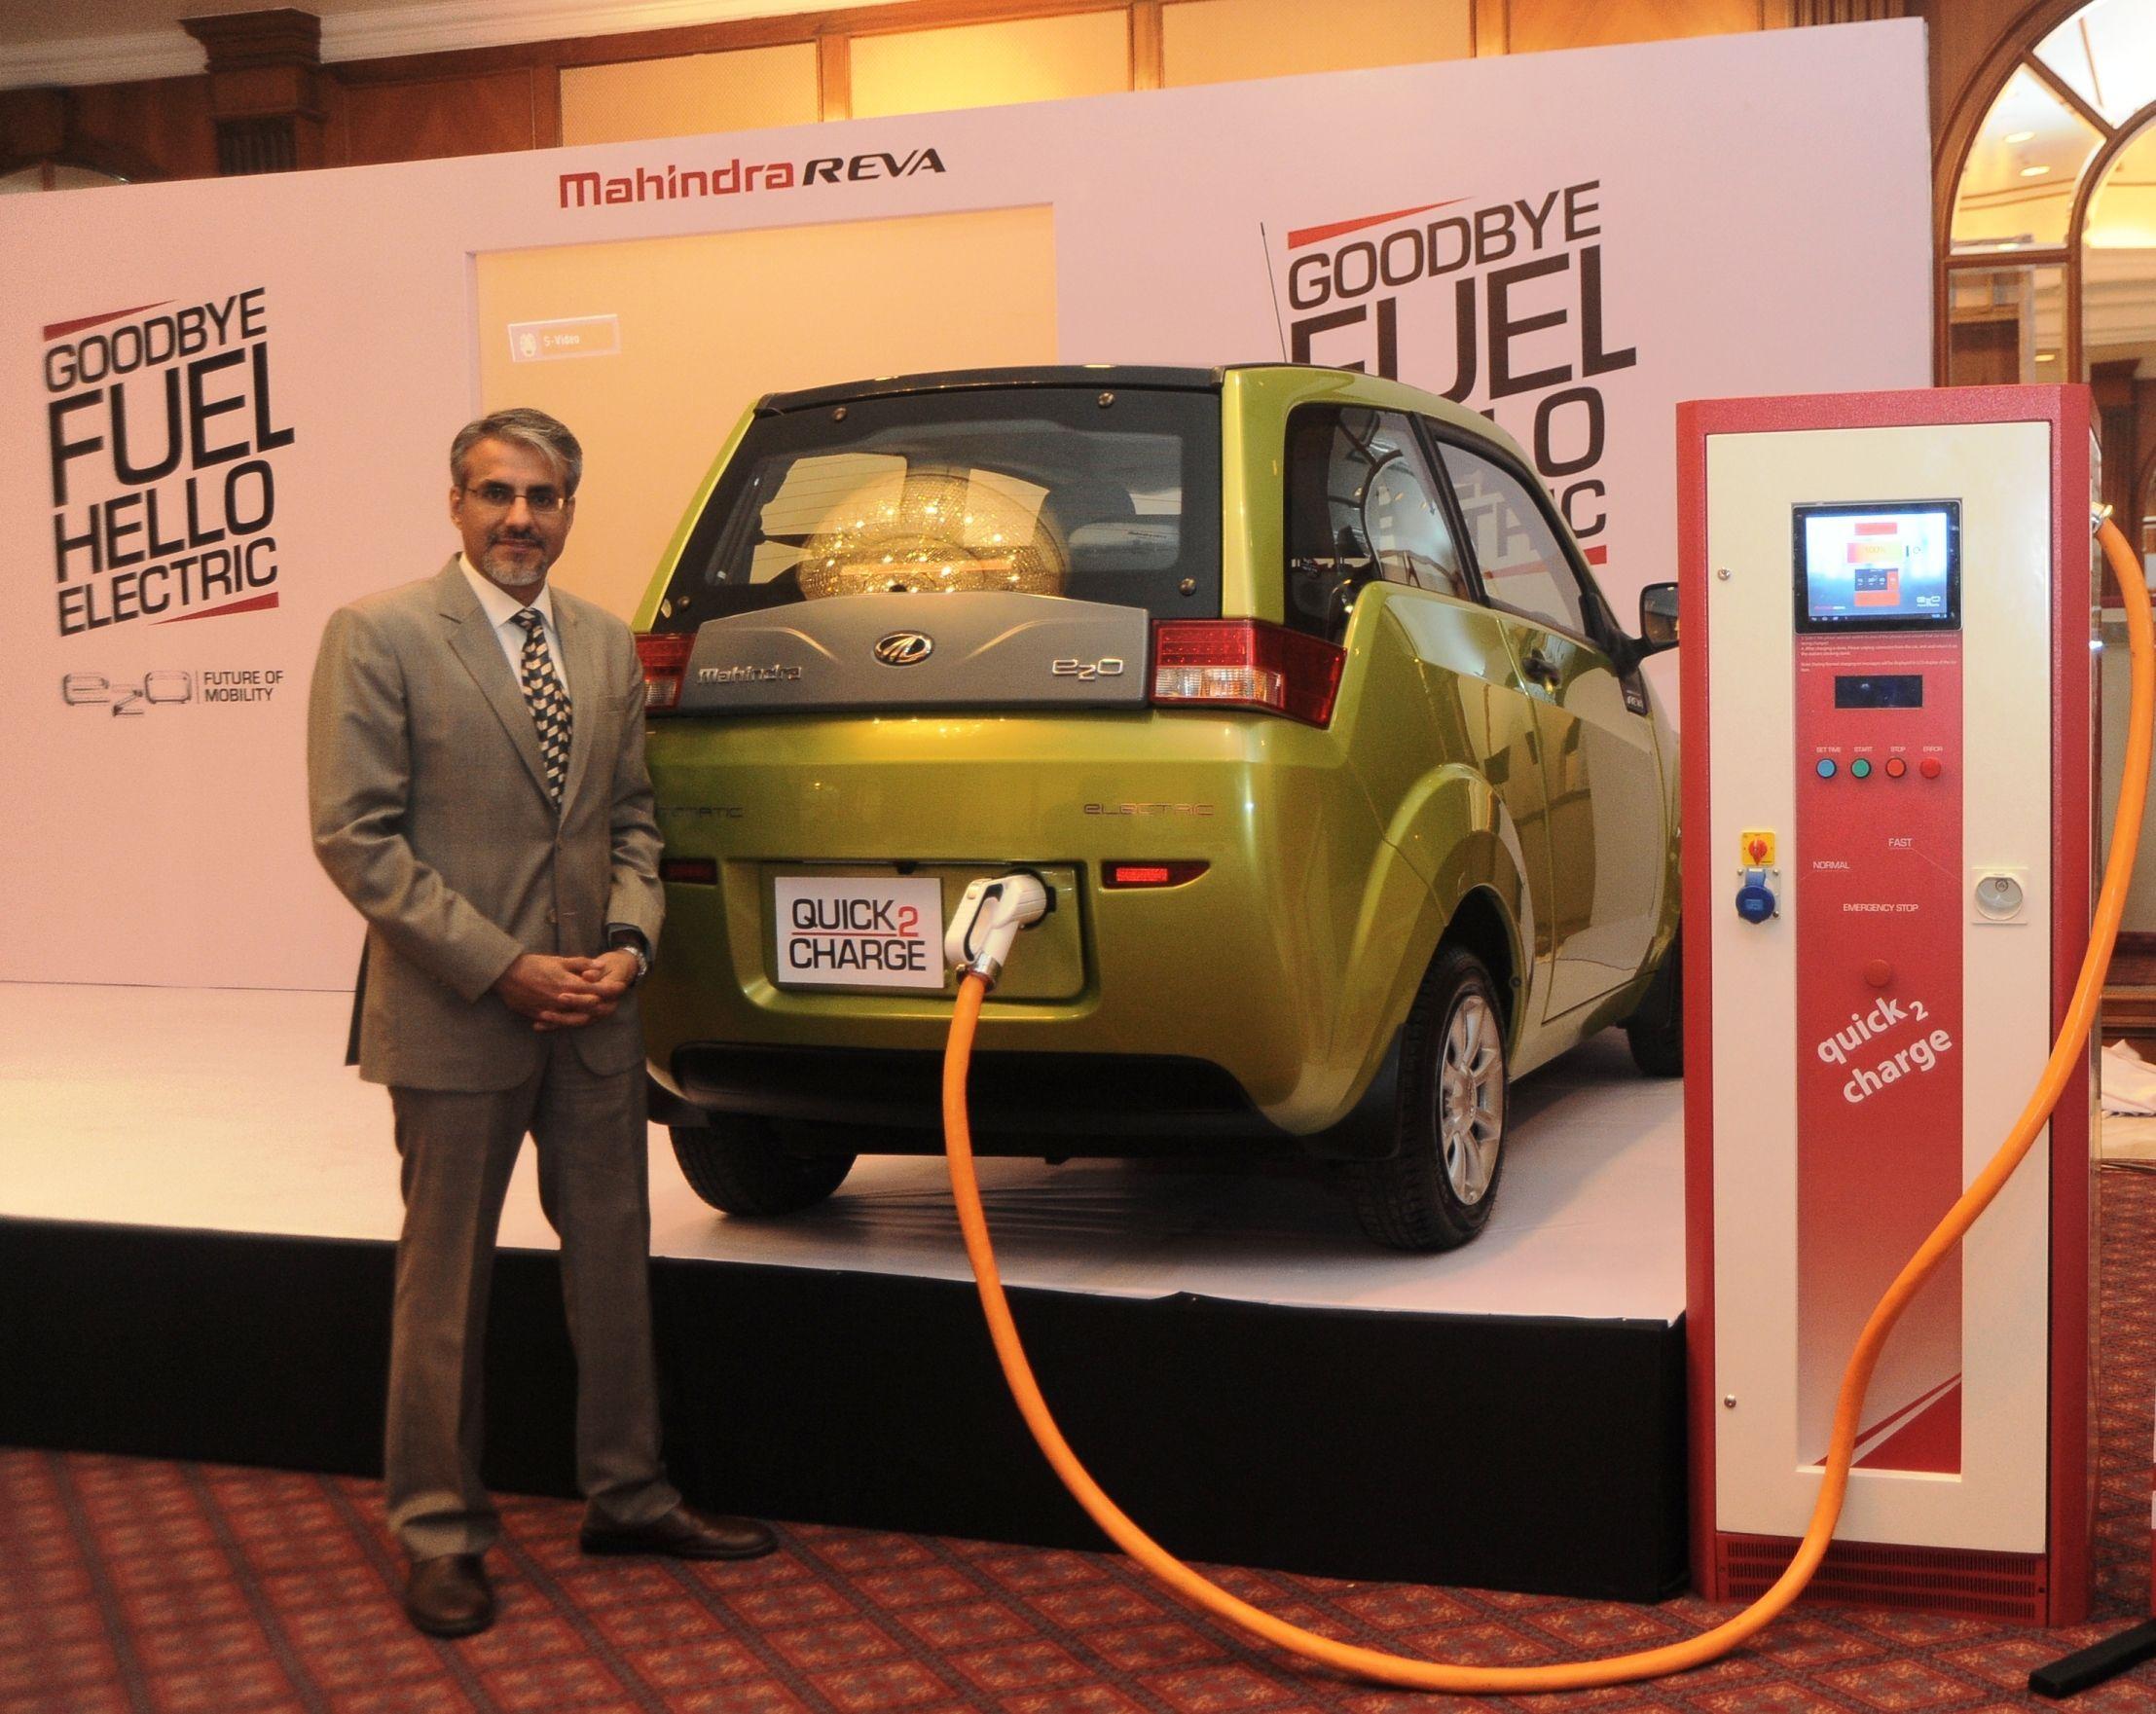 Used Reva Electric Car In Chennai